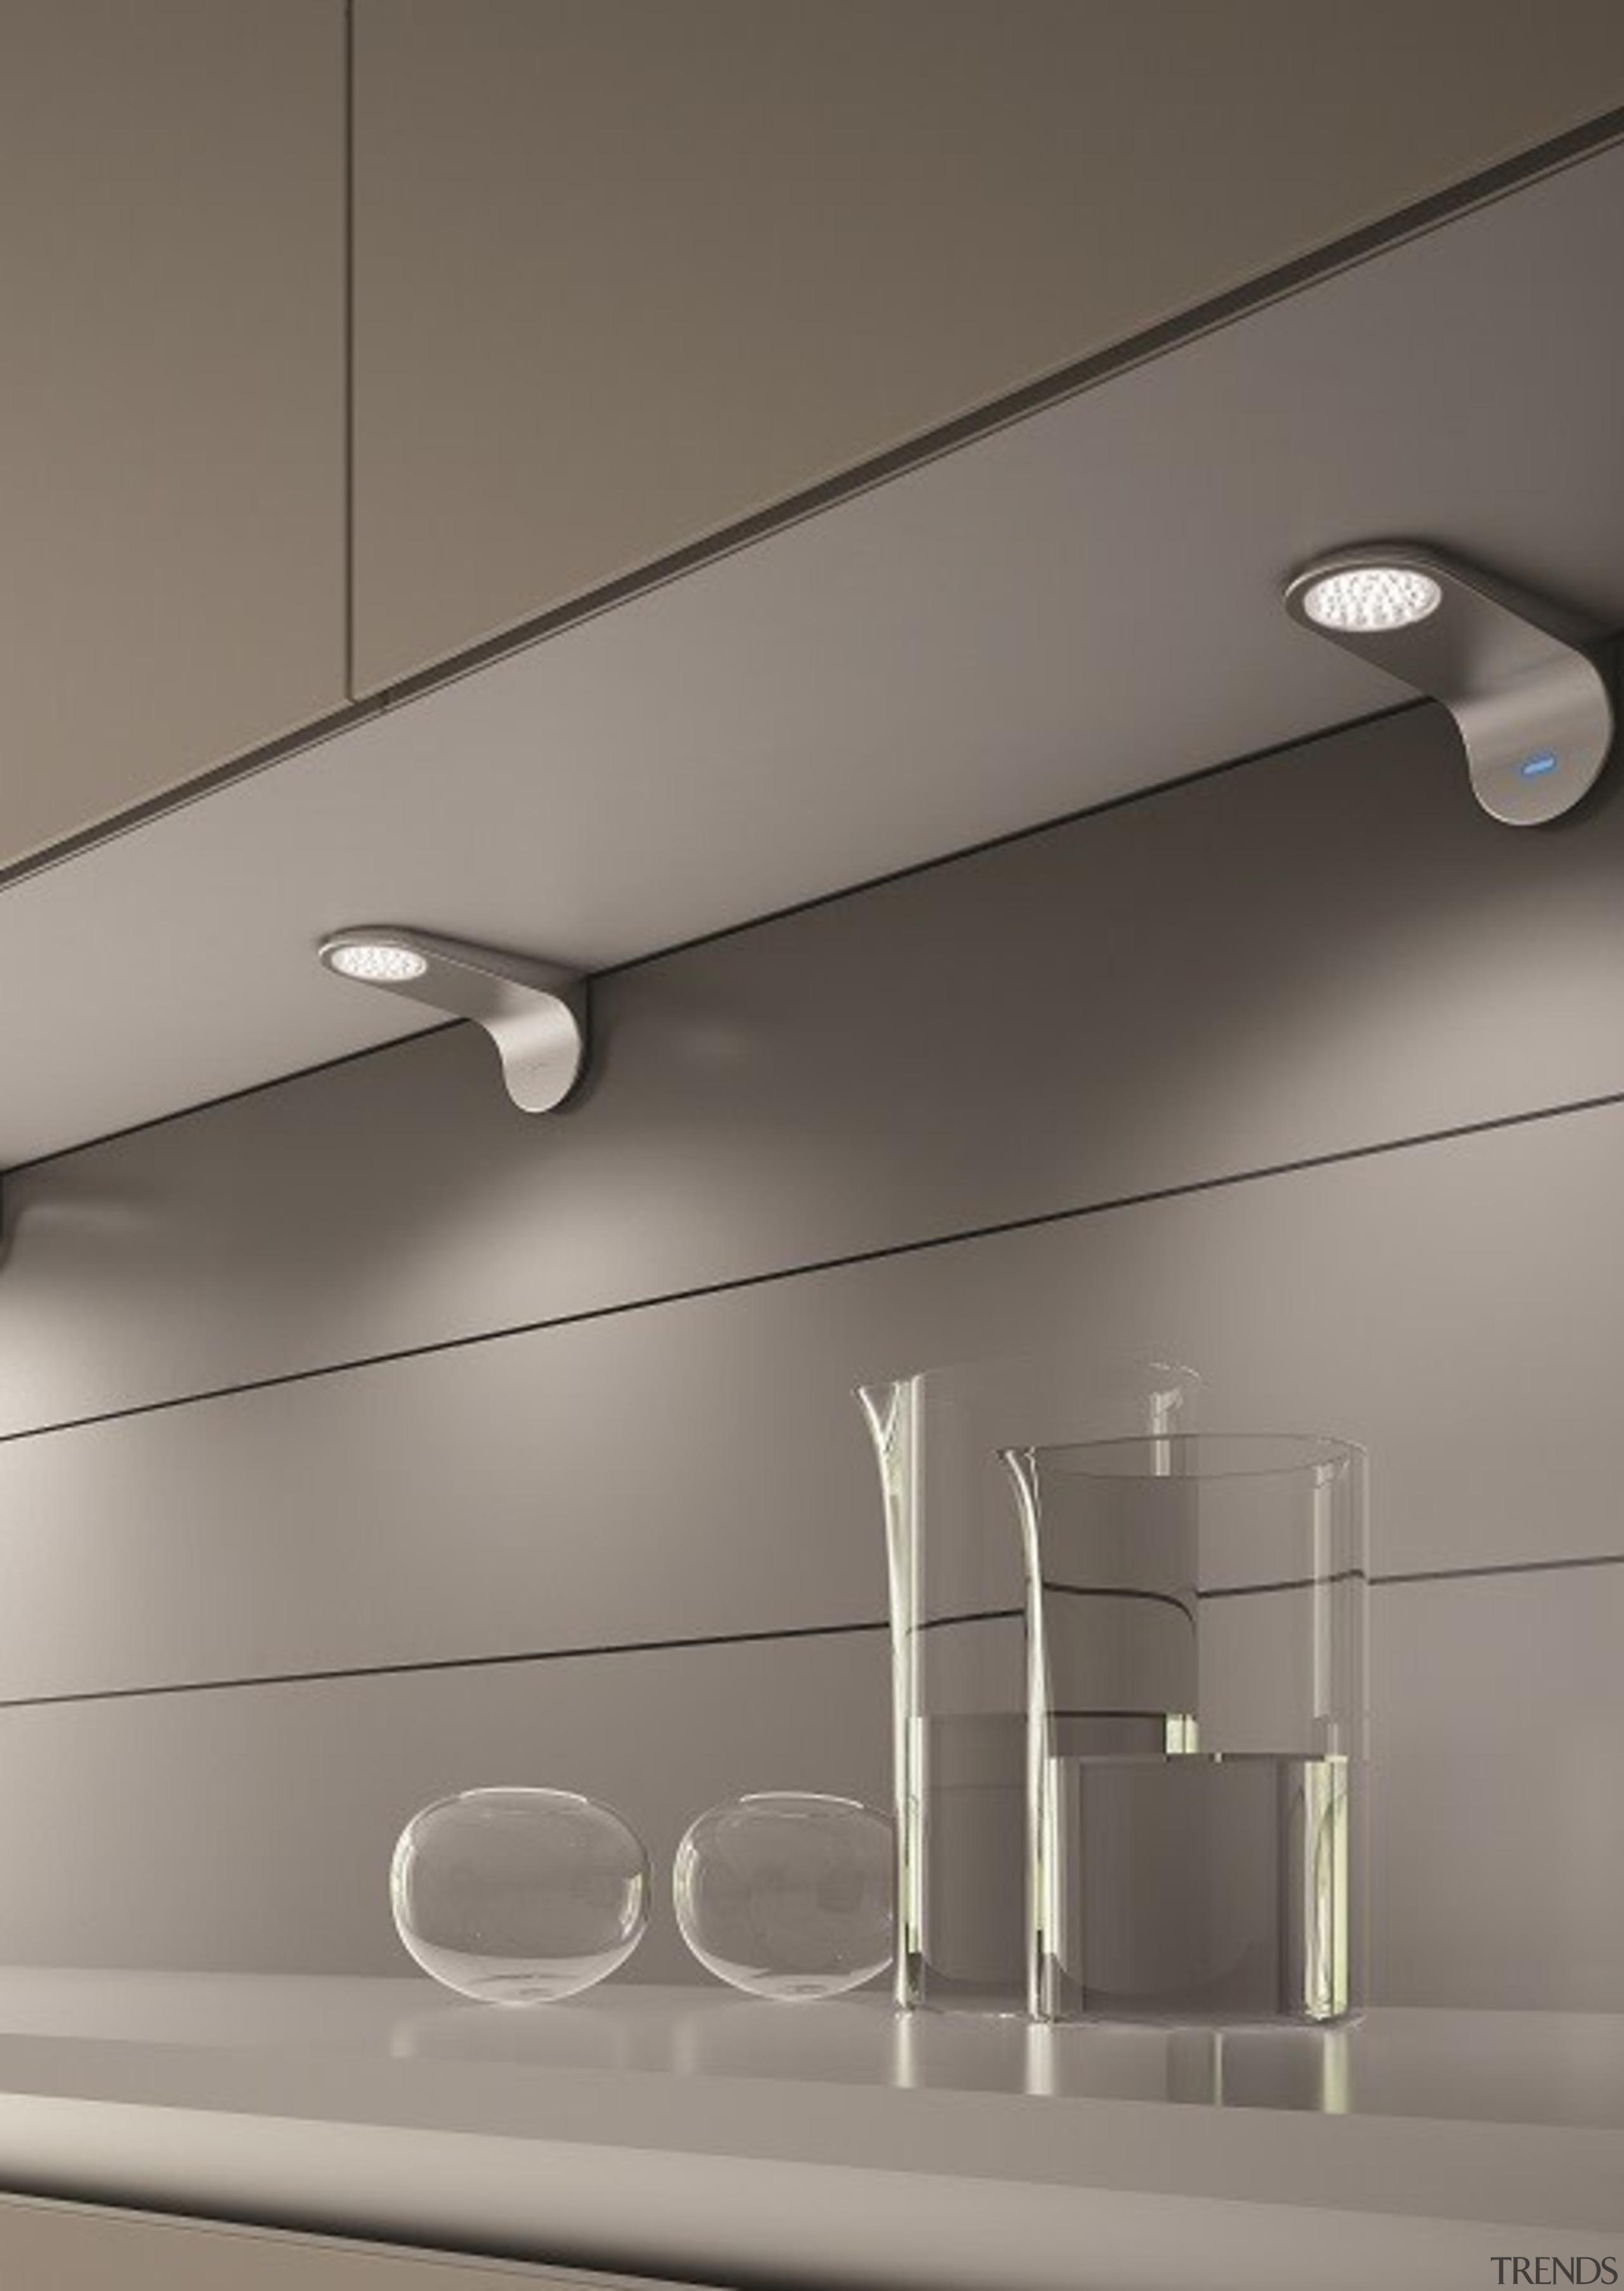 Domus Line Kite Master & Slave LED SpotlightsMade architecture, ceiling, daylighting, light, light fixture, lighting, product design, tap, gray